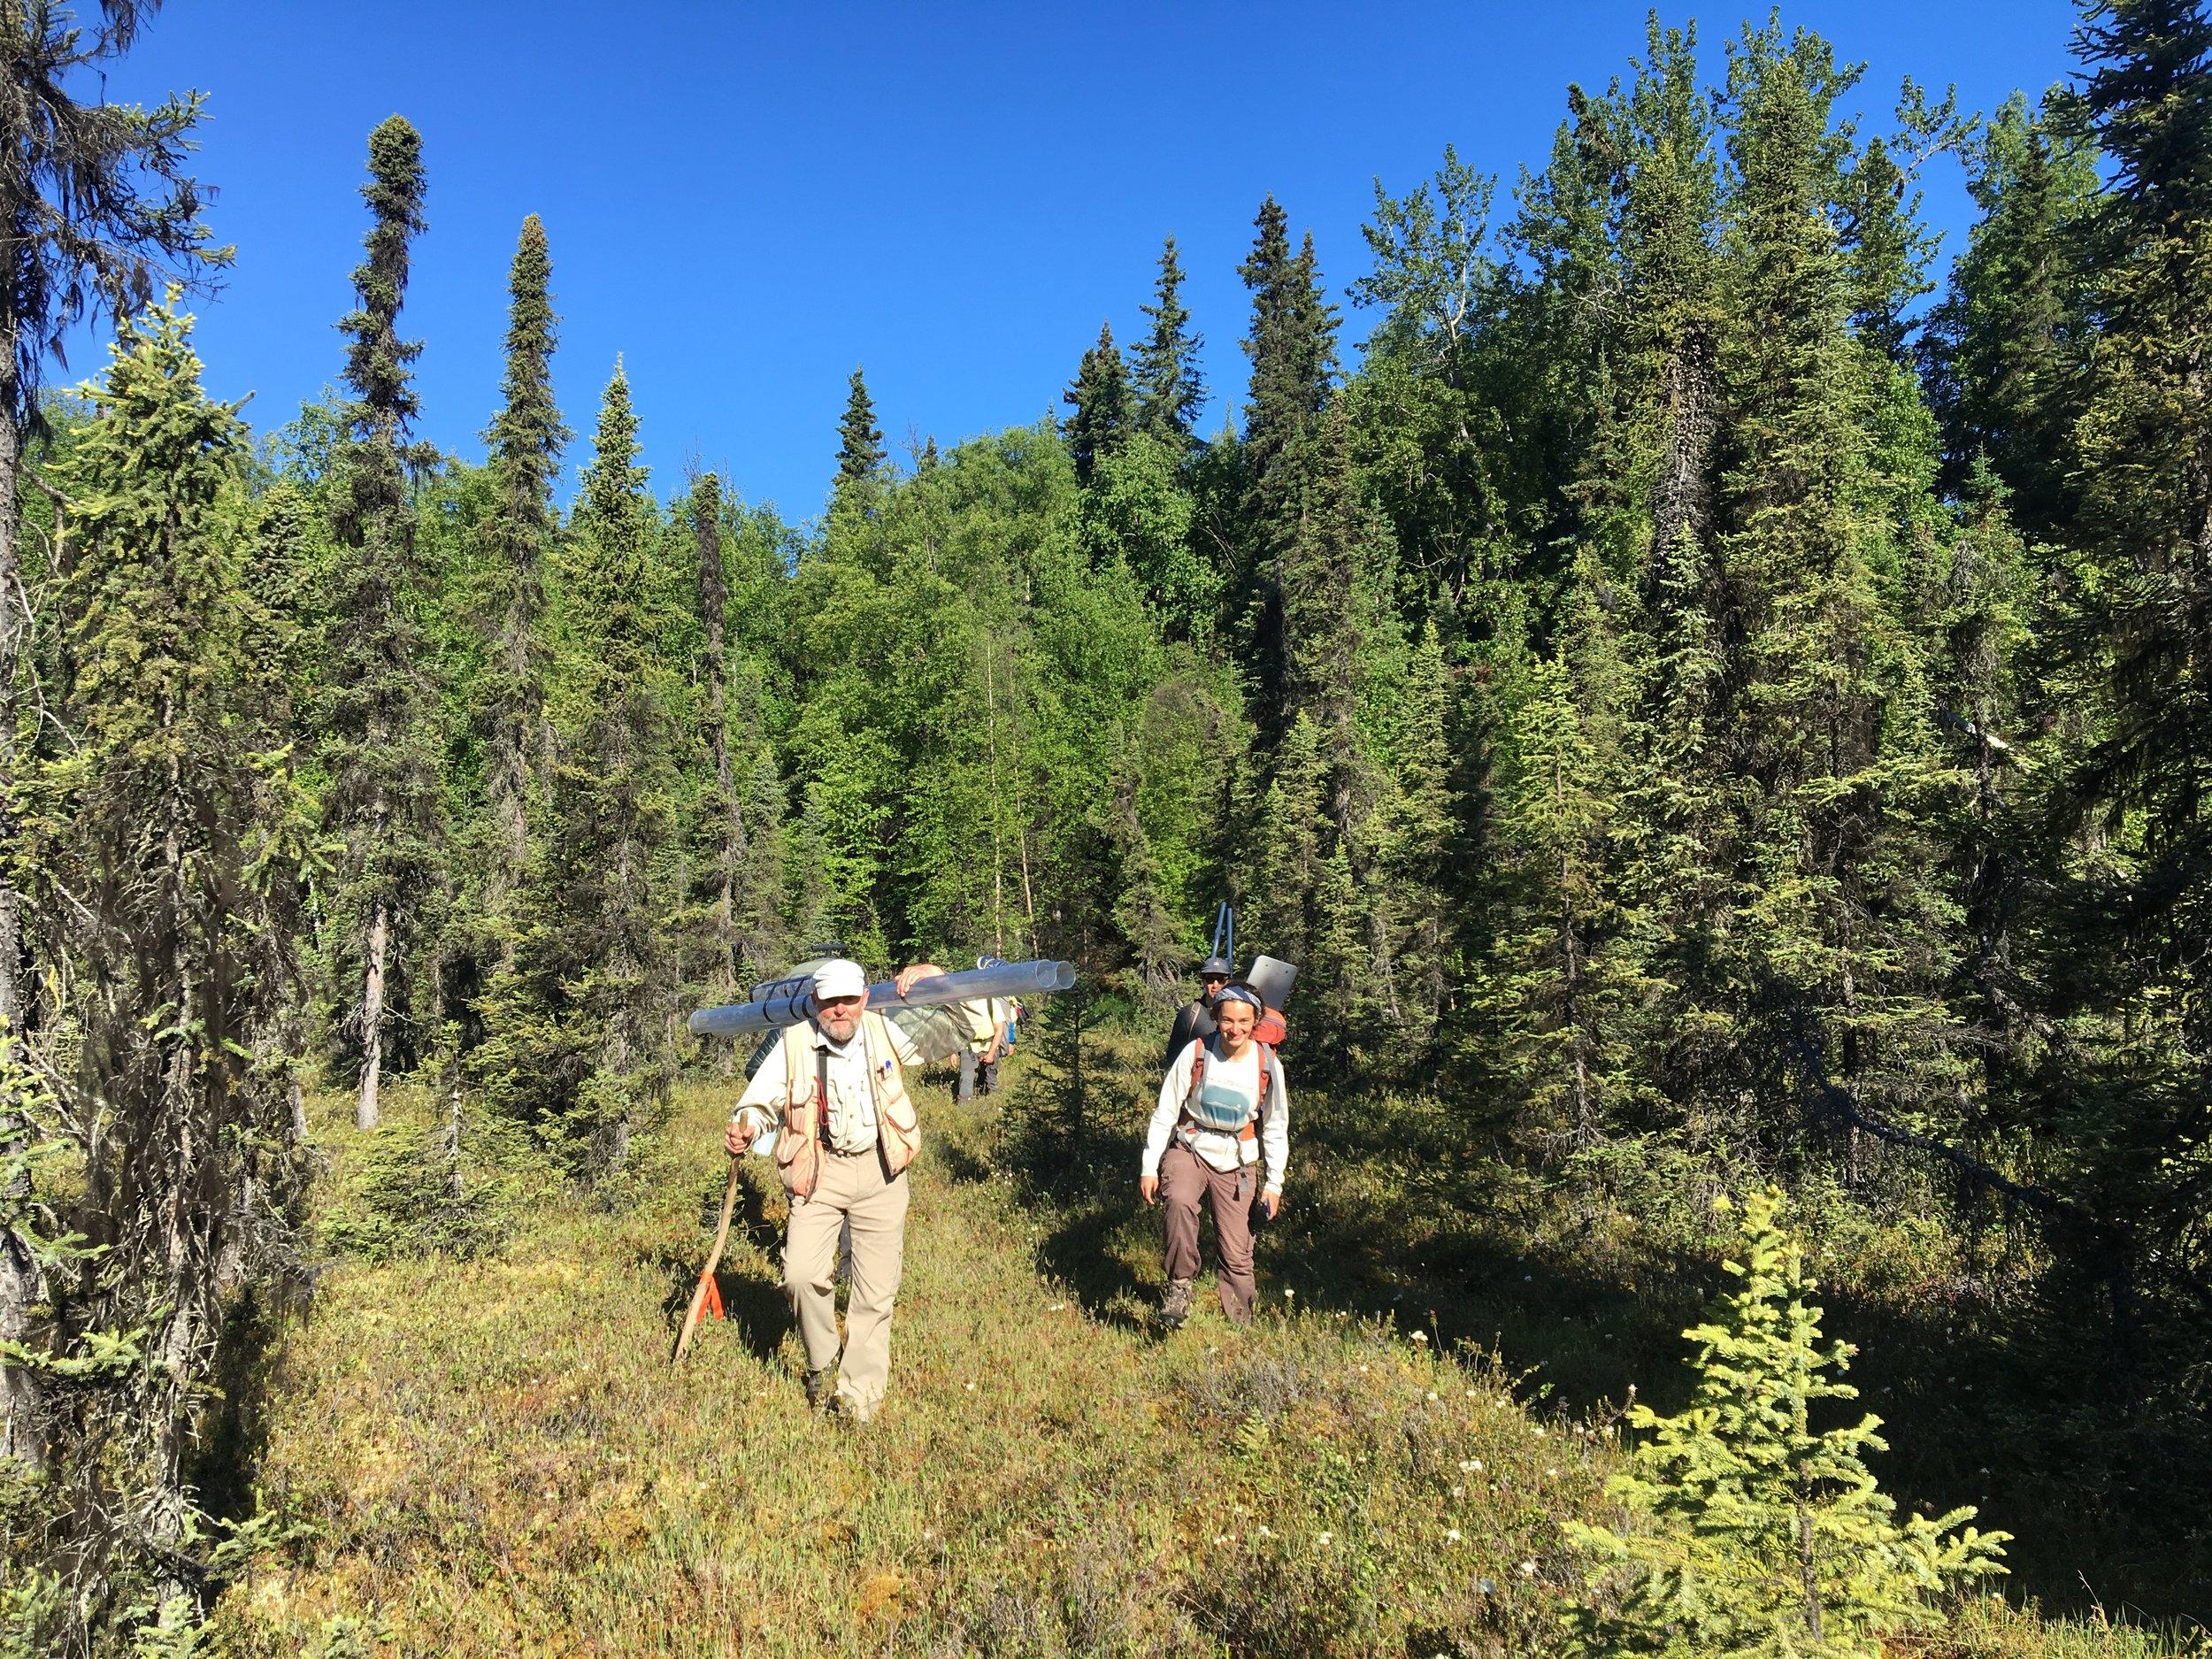 Ed Berg and Ellie Broadman bringing coring materials into Paradox Lake